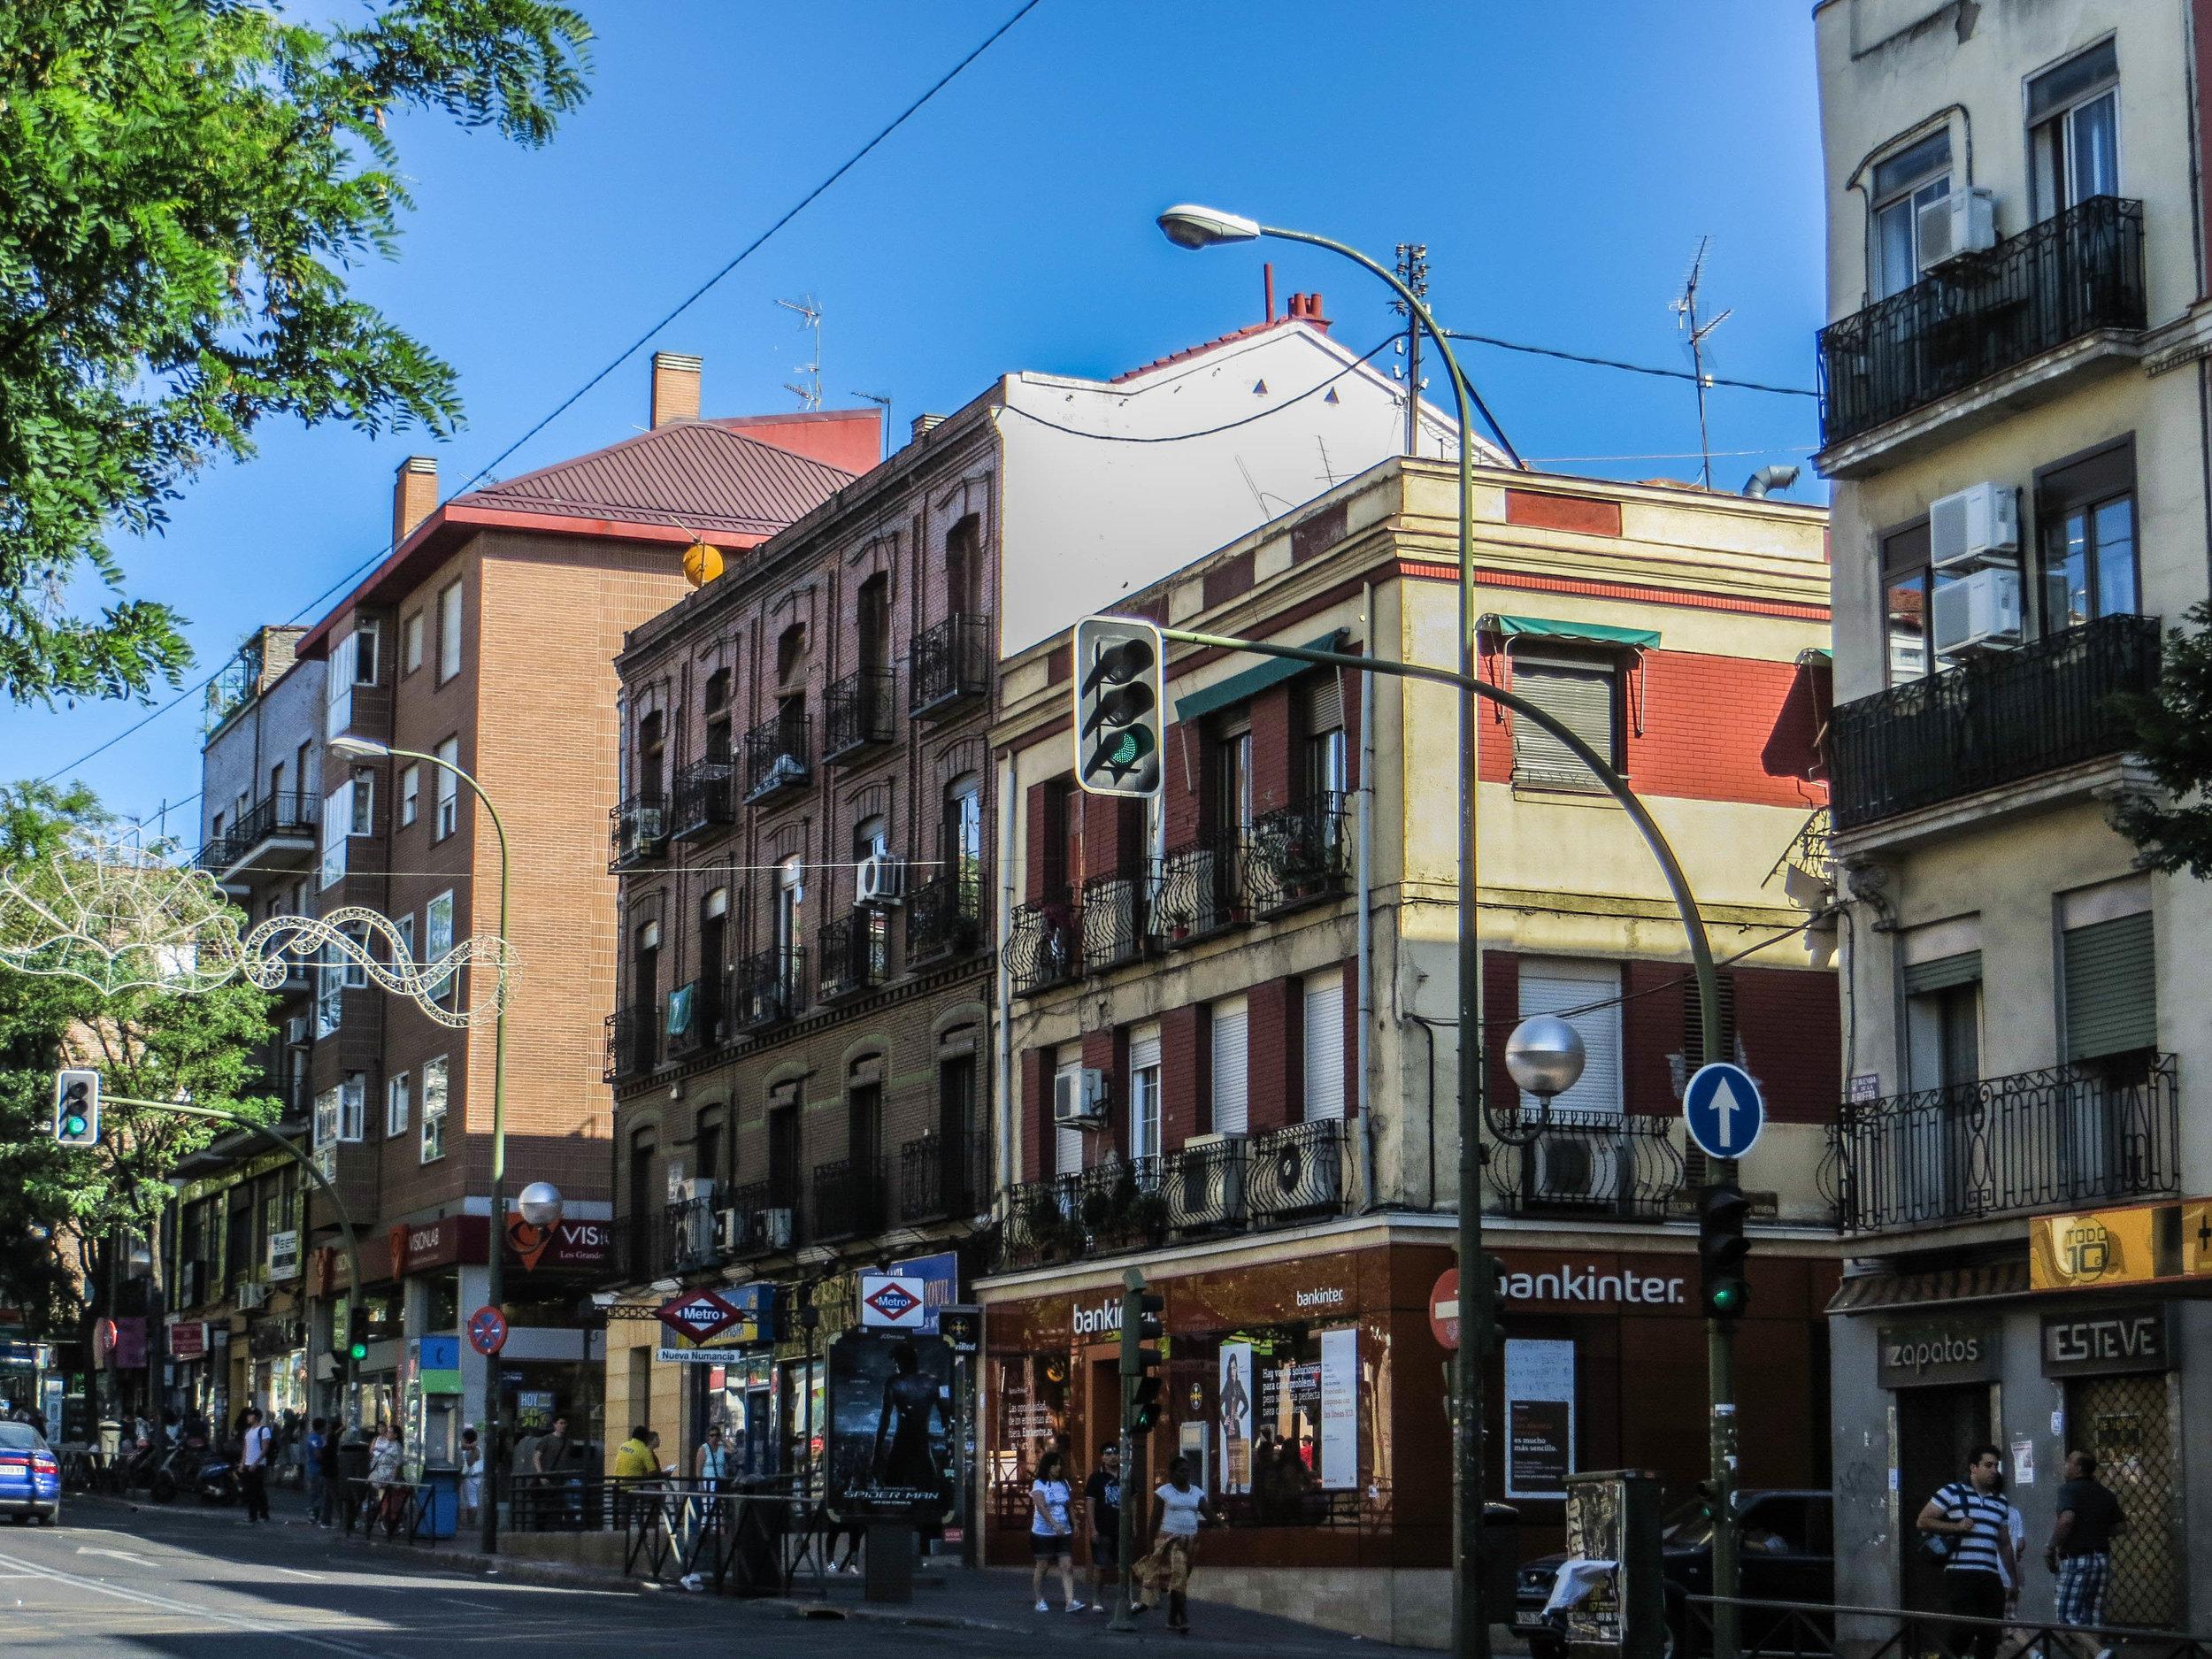 madrid-spain-streets-summer-52.jpg